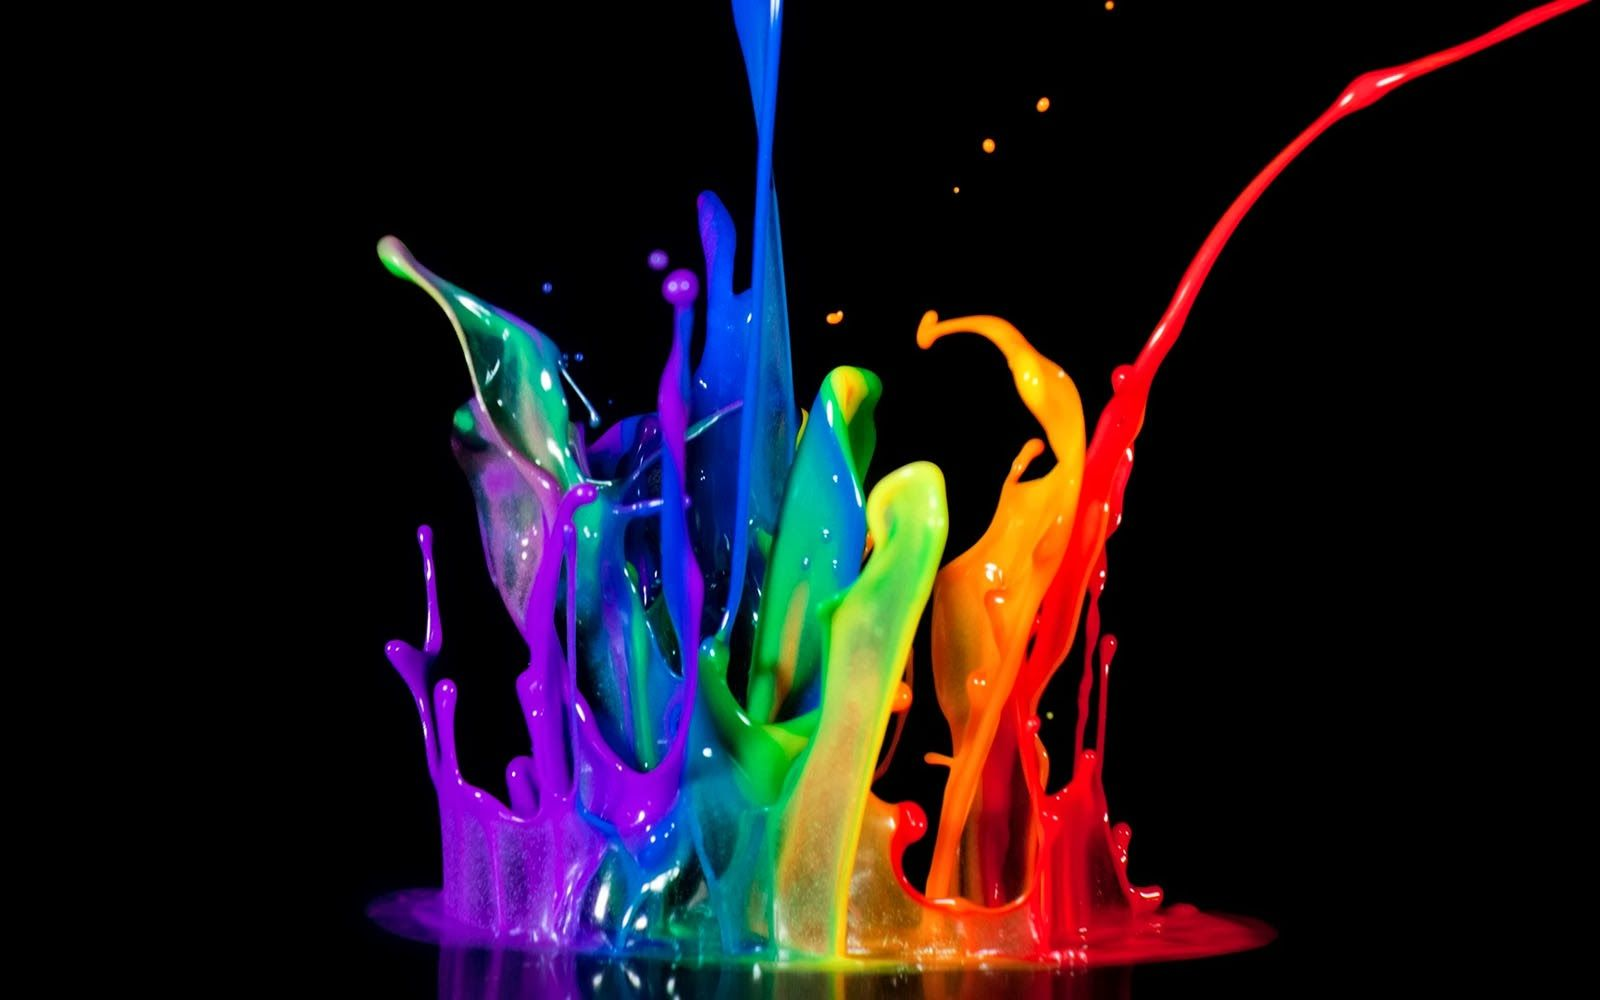 Hd background wallpaper ink splash black background ink splatter green screen yahoo image - Hd ink wallpaper ...